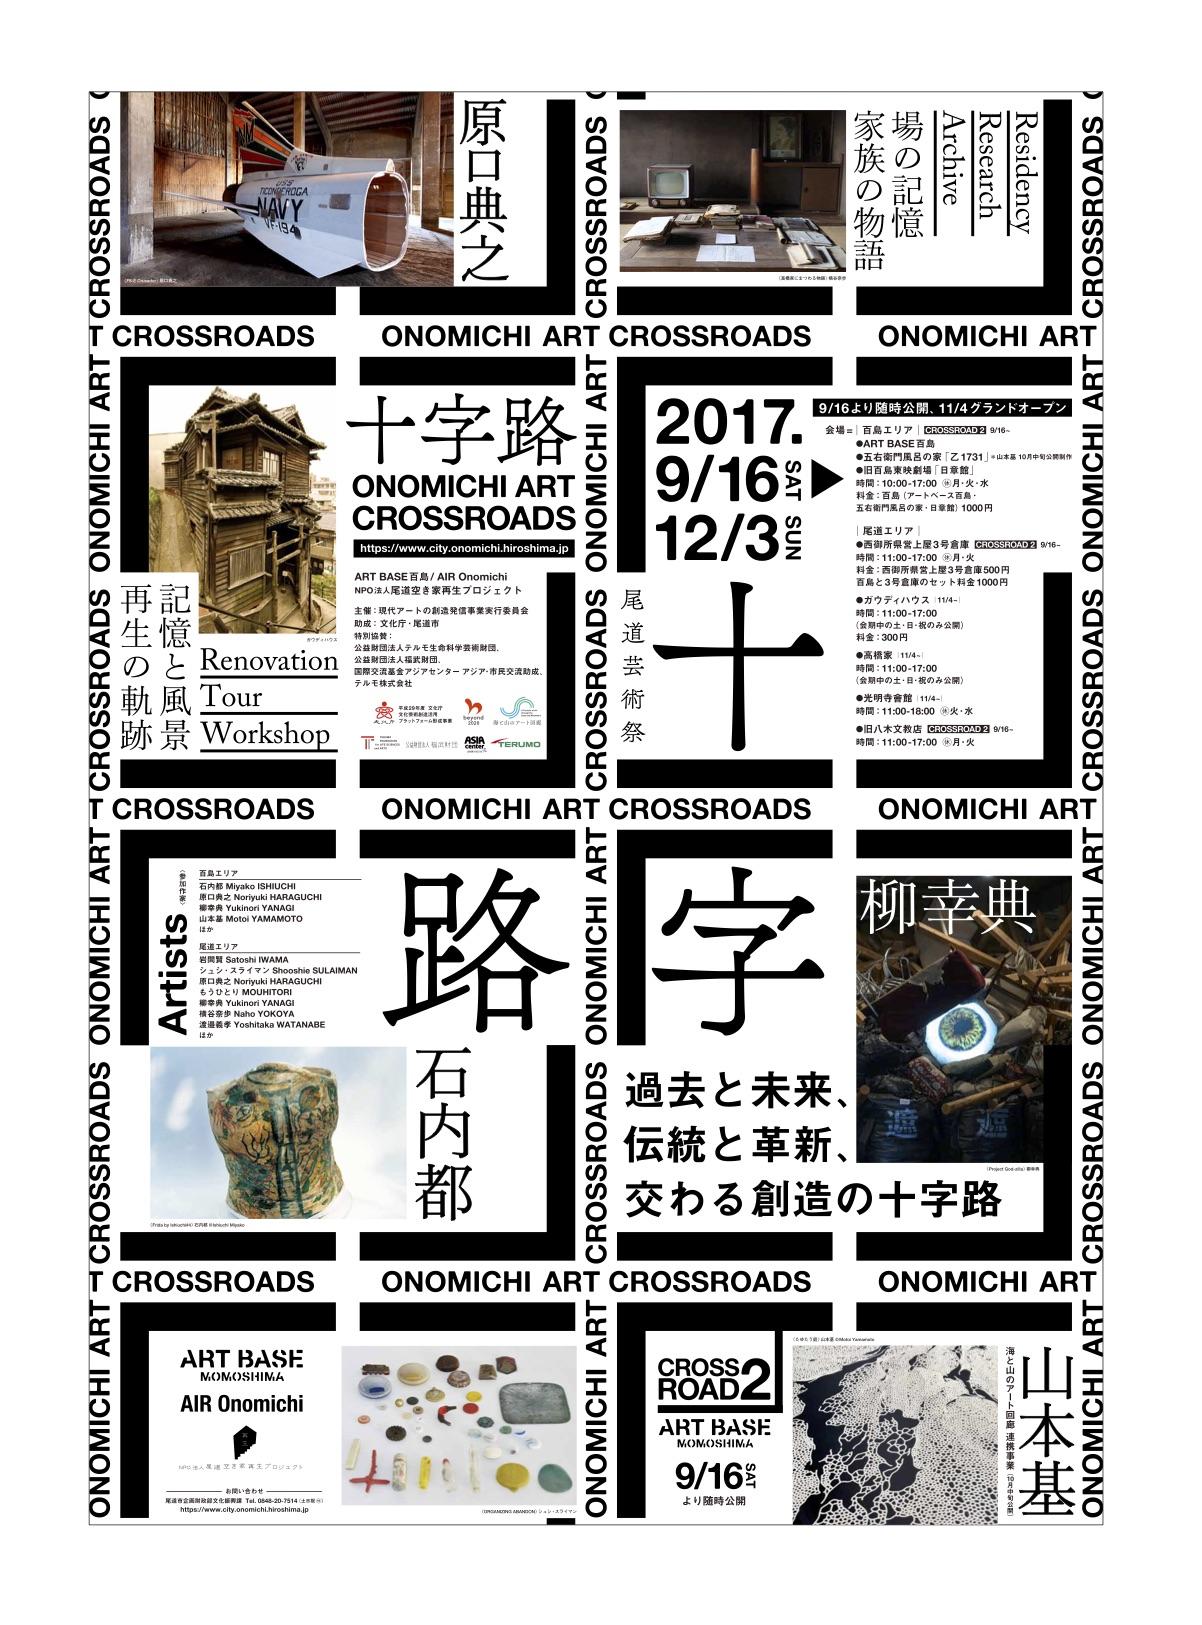 20170808-crossroad_0803.jpg